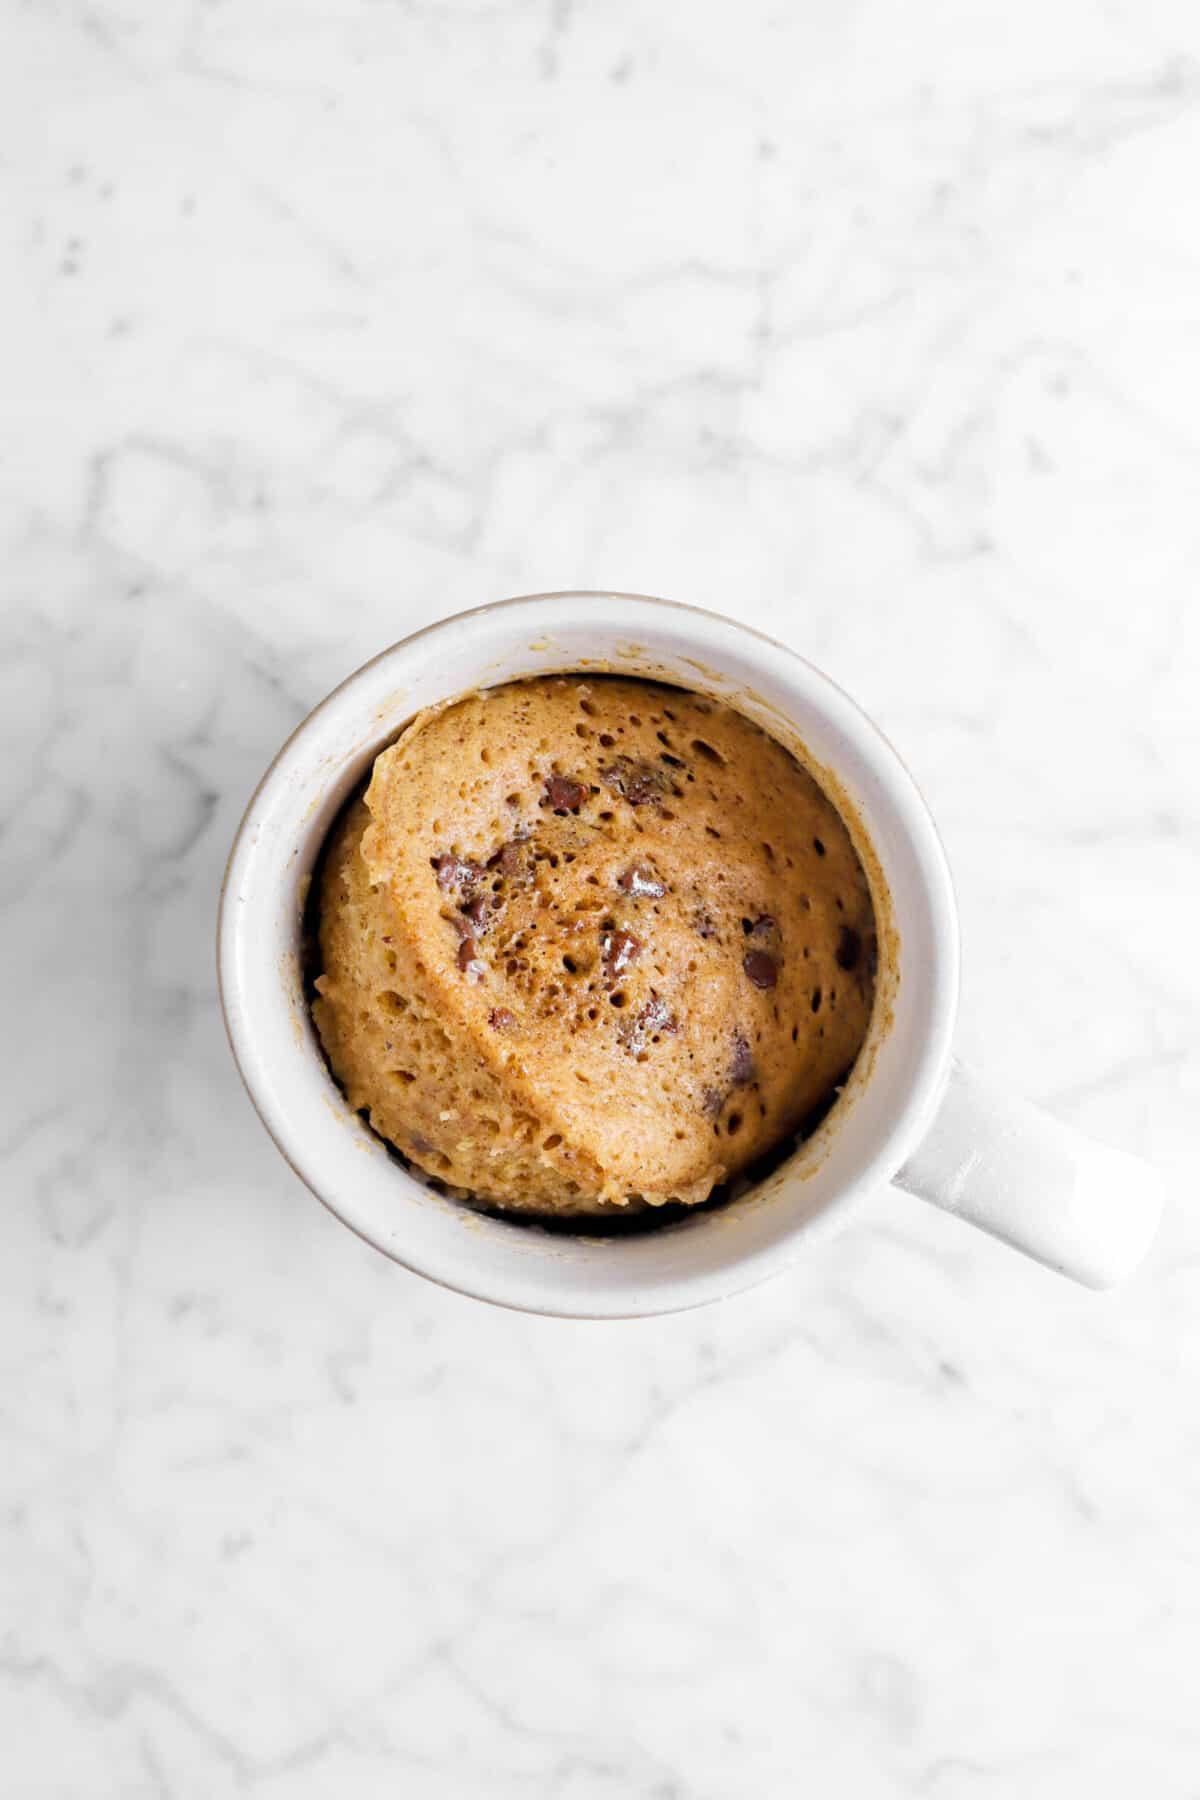 chocolate chip gingerbread cake in a mug